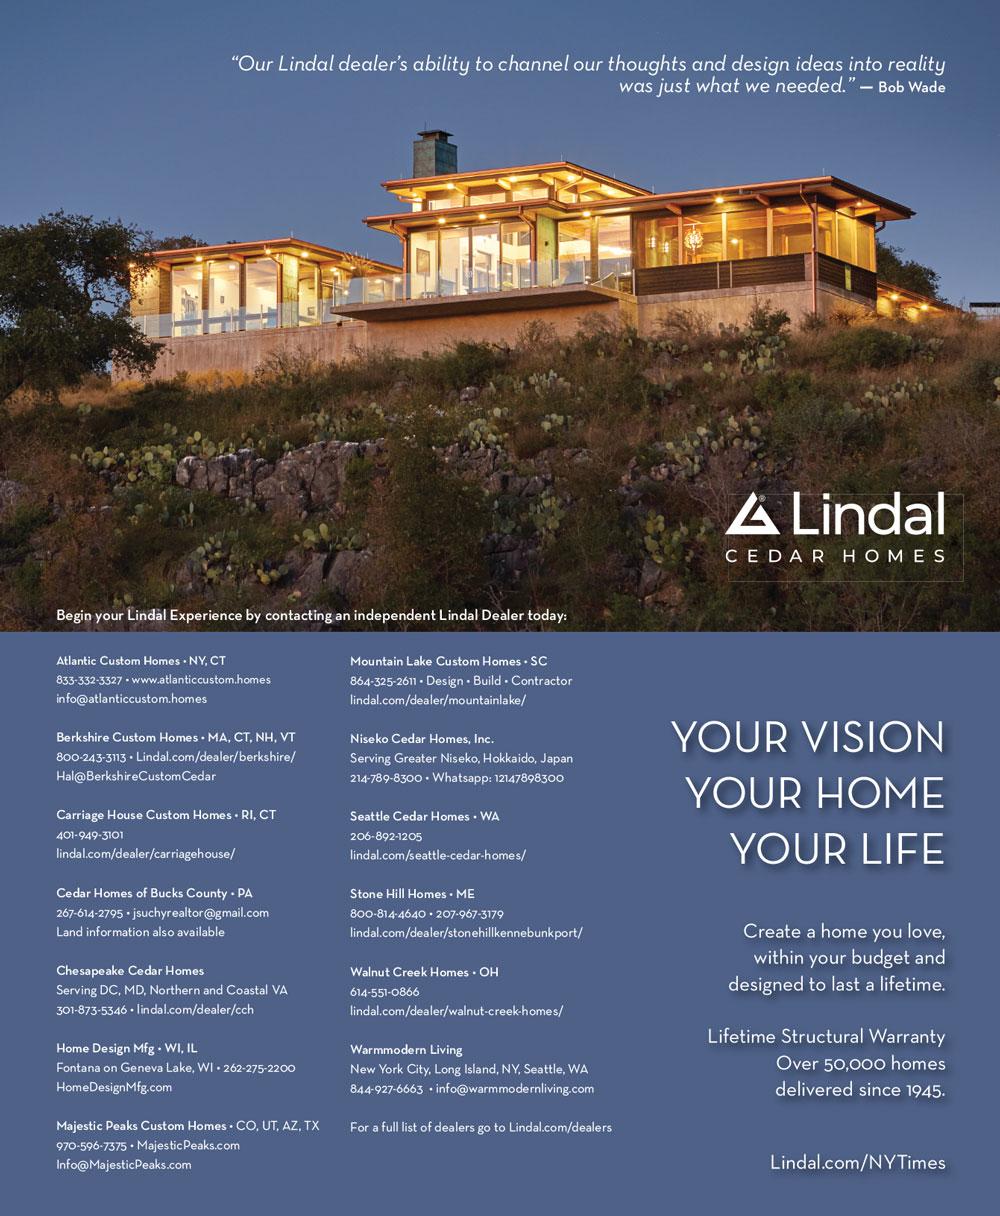 New York Times Lindal Cedar Homes ad 2020